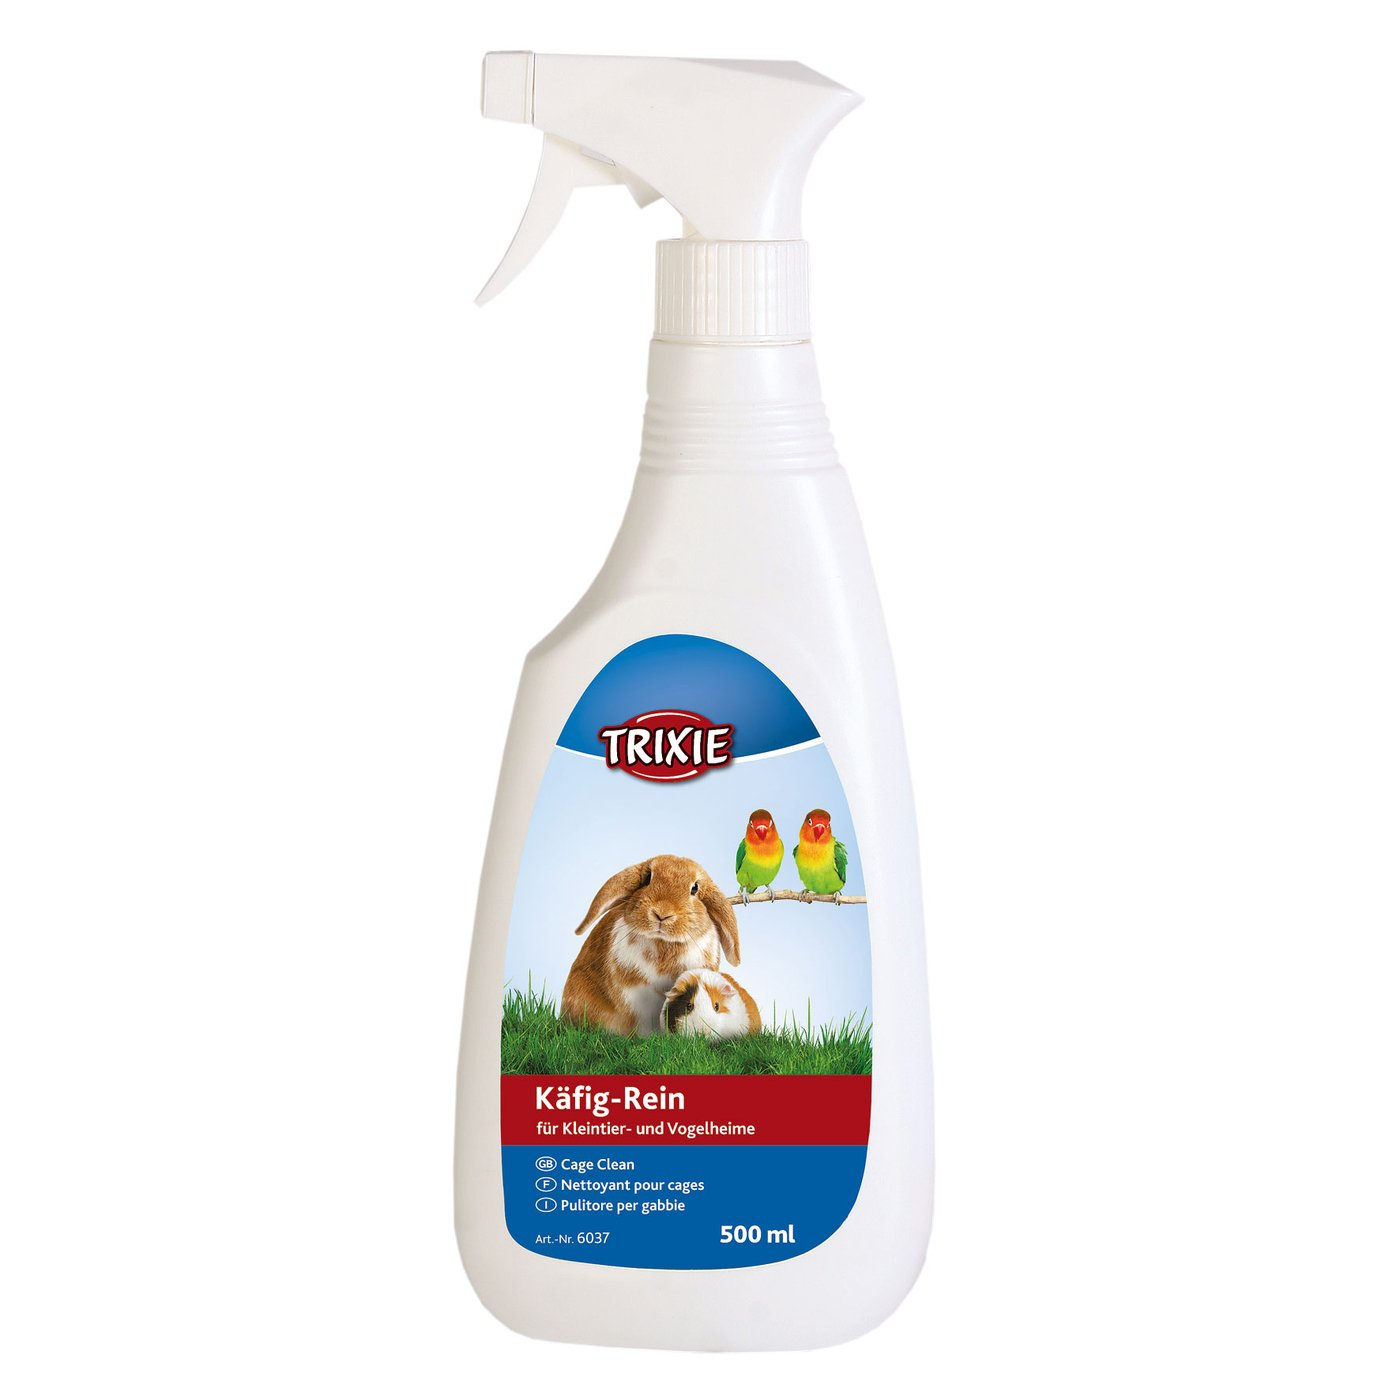 Trixie Desinfectante Jaulas, 500 ml: Amazon.es: Productos para ...